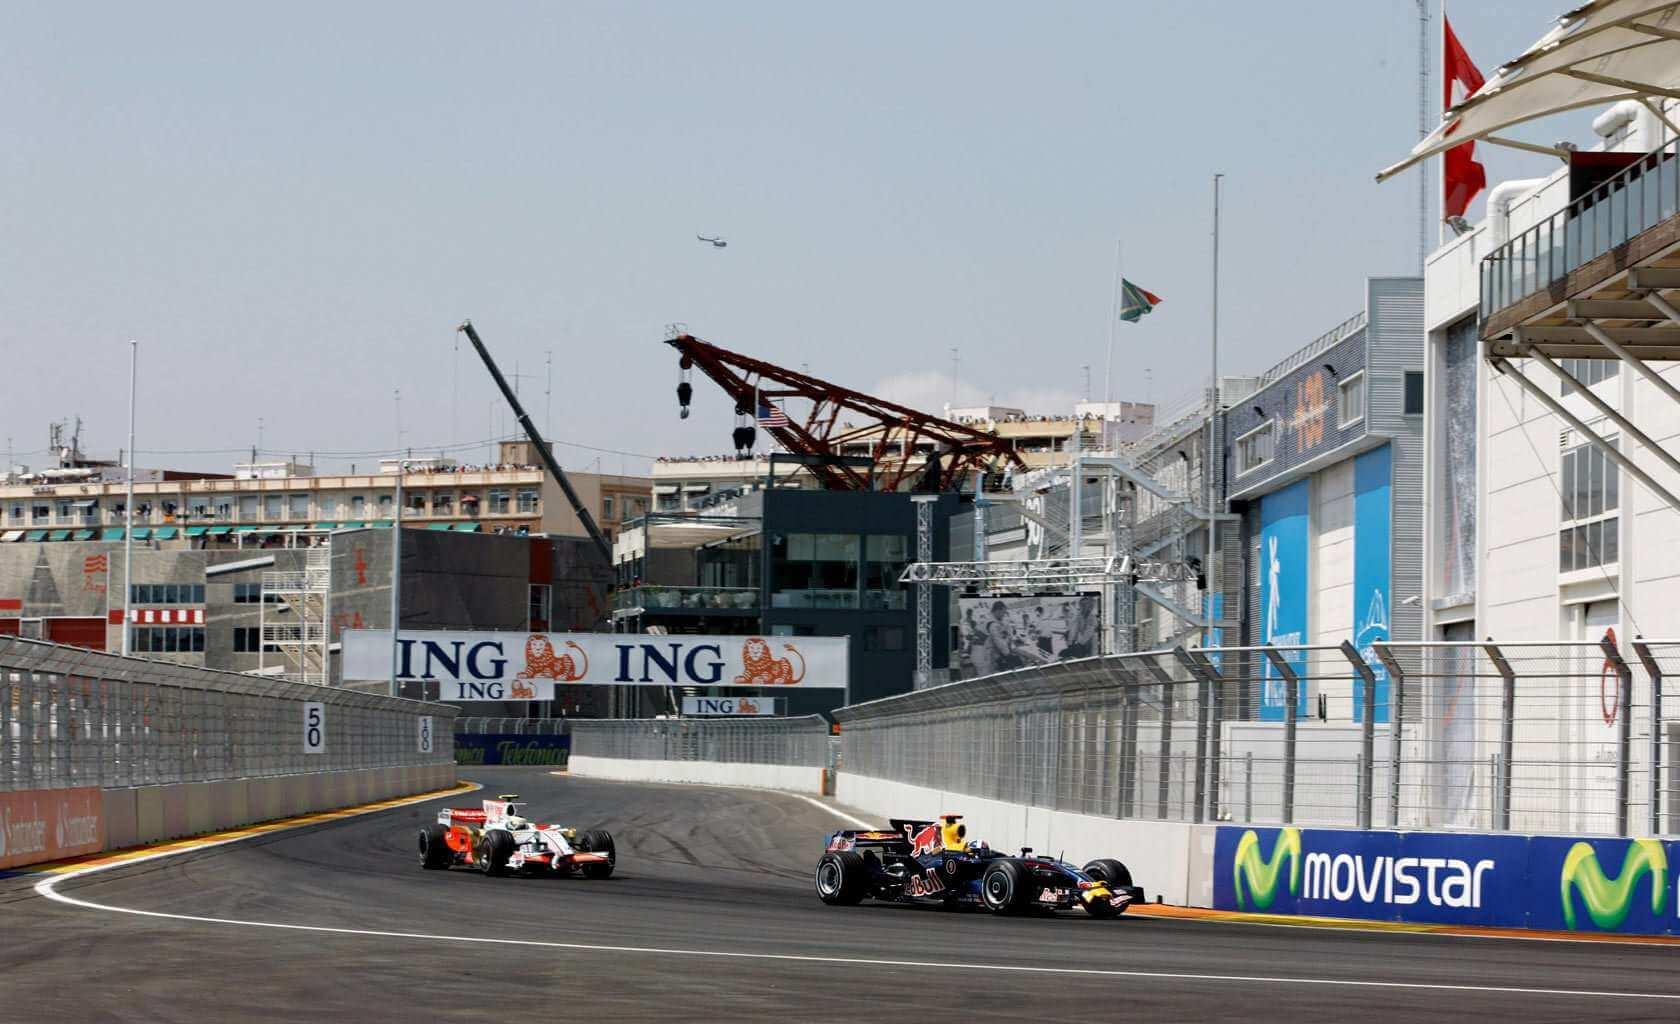 Circuito Valencia F1 : Valencia street circuit valencia spain sports venue sportsmatik